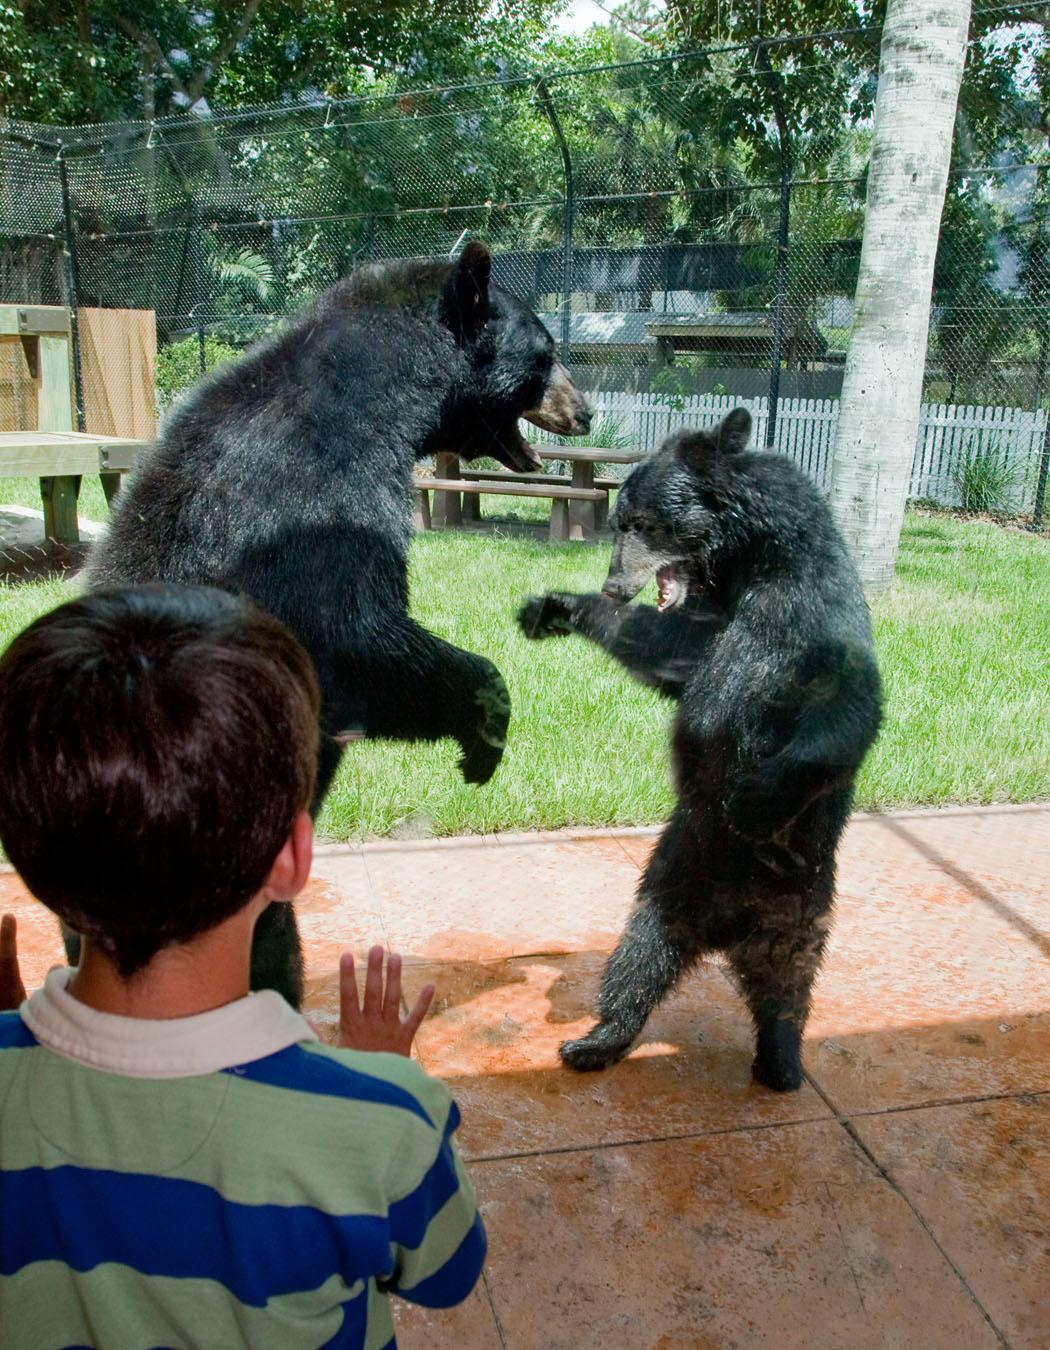 Naples Zoo Animal sanctuary and botanical garden